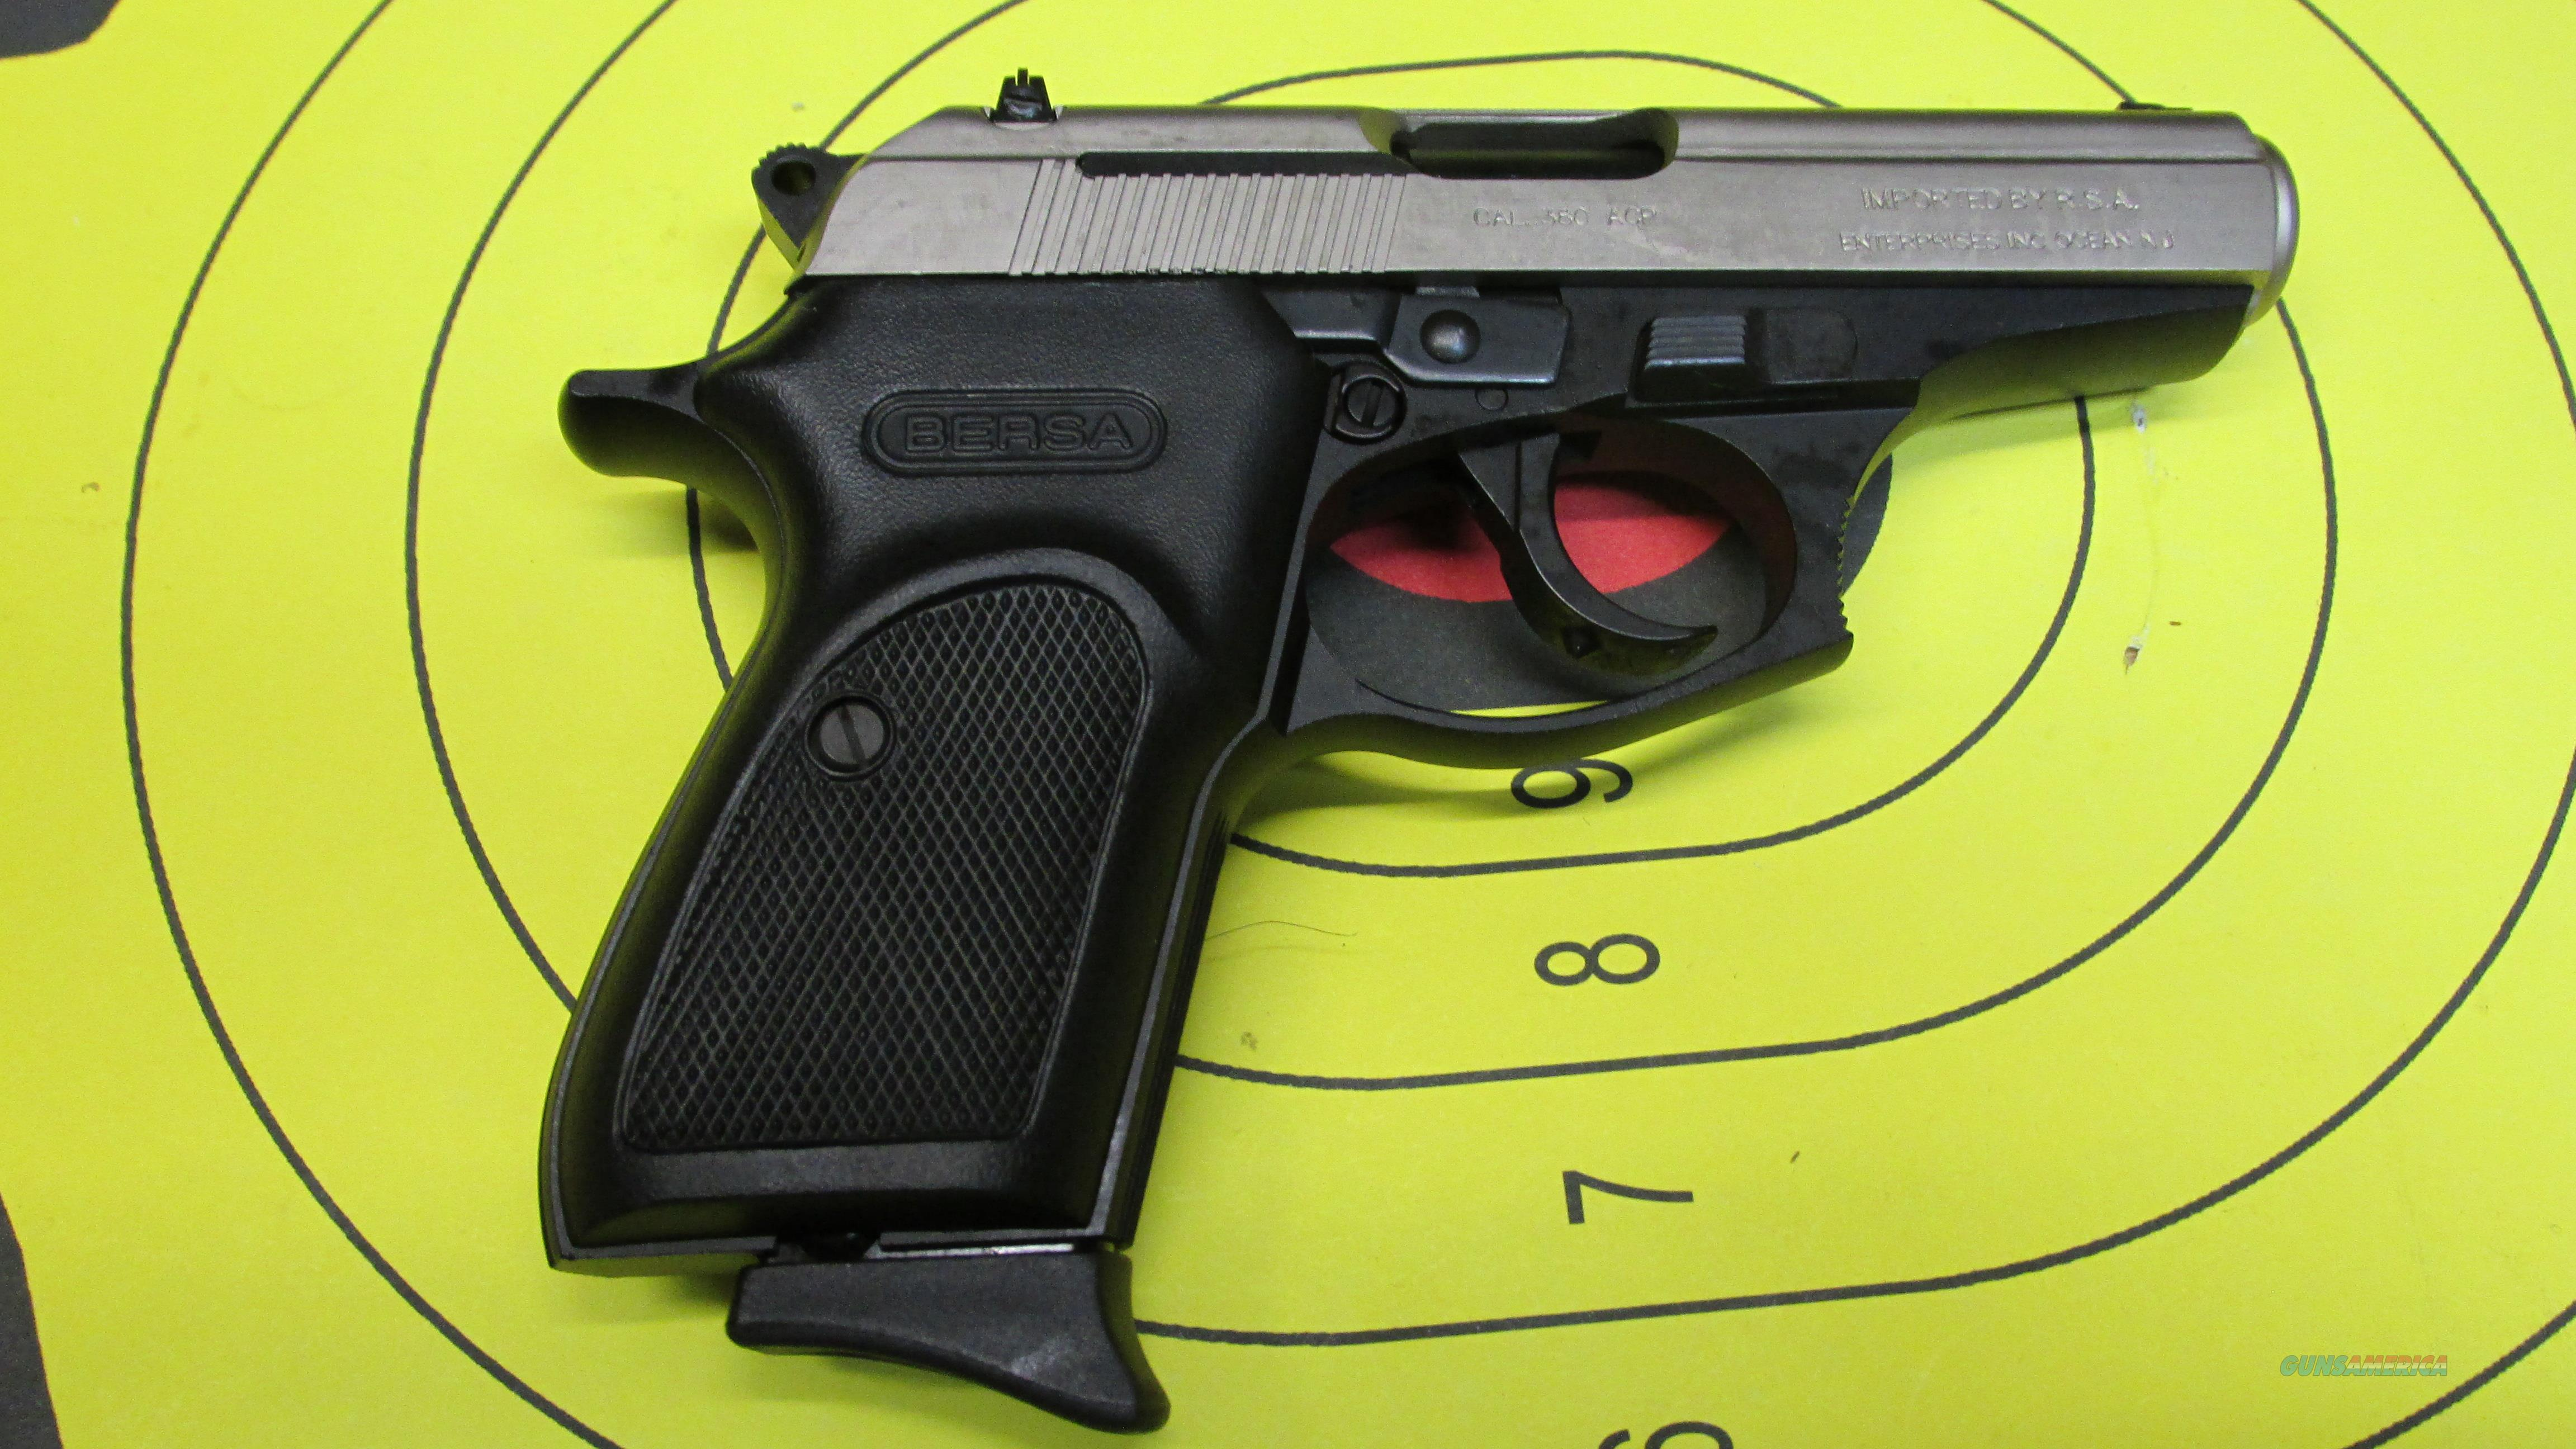 "BERSA THUNDER 380 REVERSE DUO TONE .380 ACP PISTOL 8 ROUND MAGAZINE WITH 3.5"" BARREL  Guns > Pistols > Bersa Pistols"